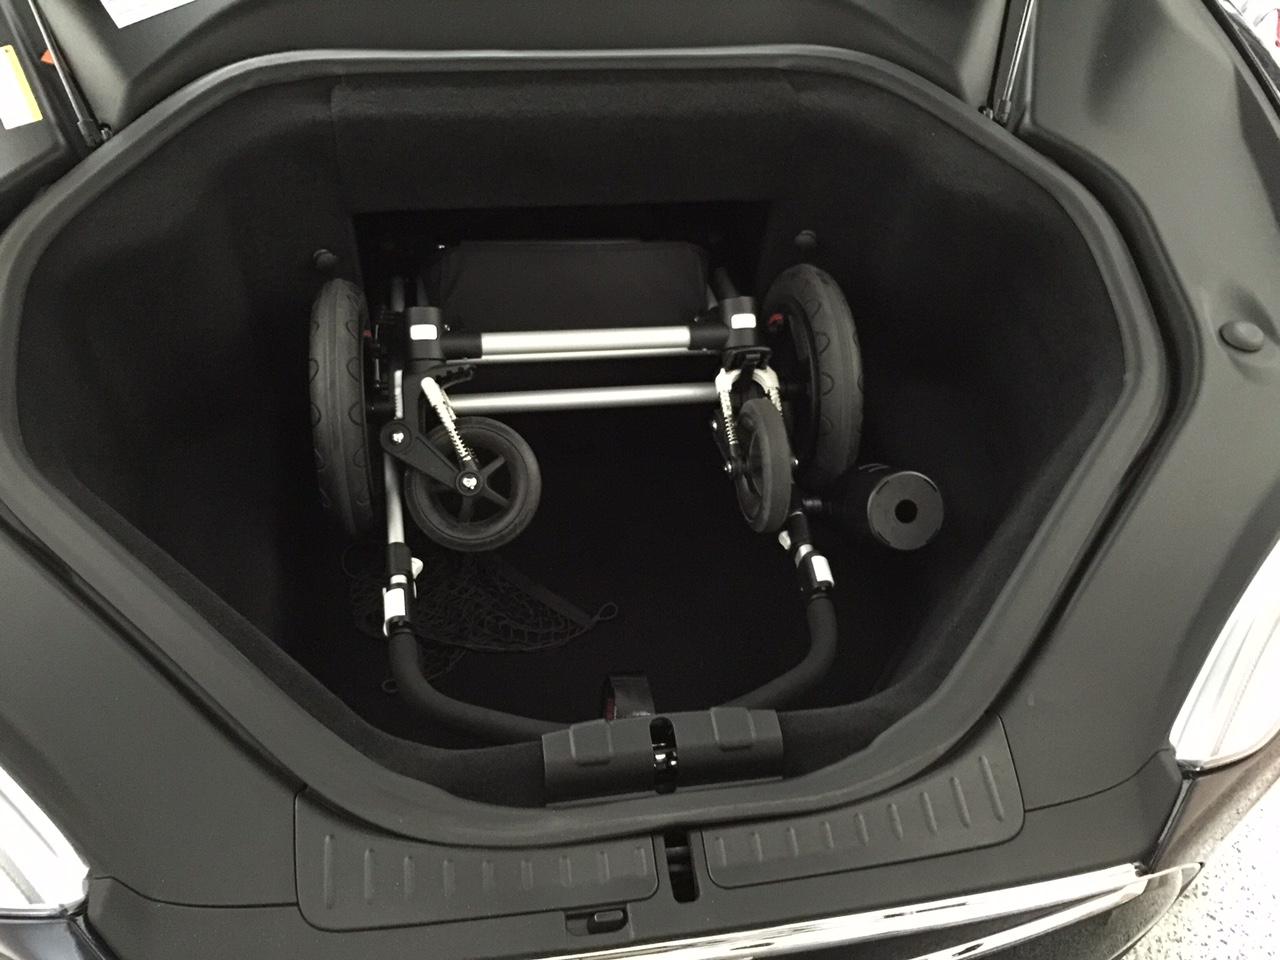 Bugaboo Cameleon in Tesla.jpg